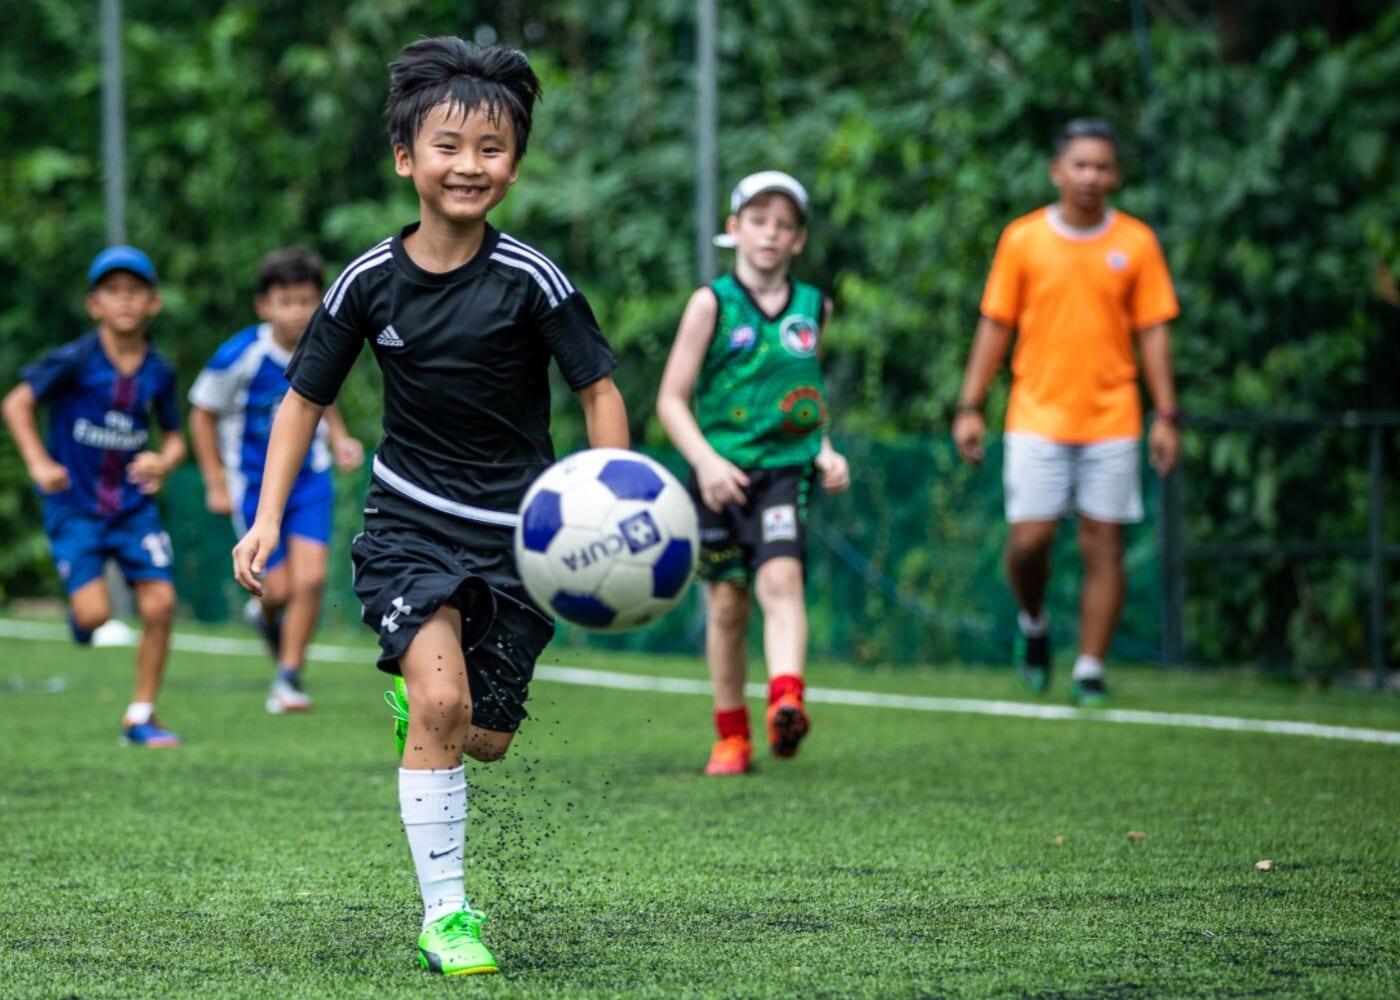 kid running towards the ball